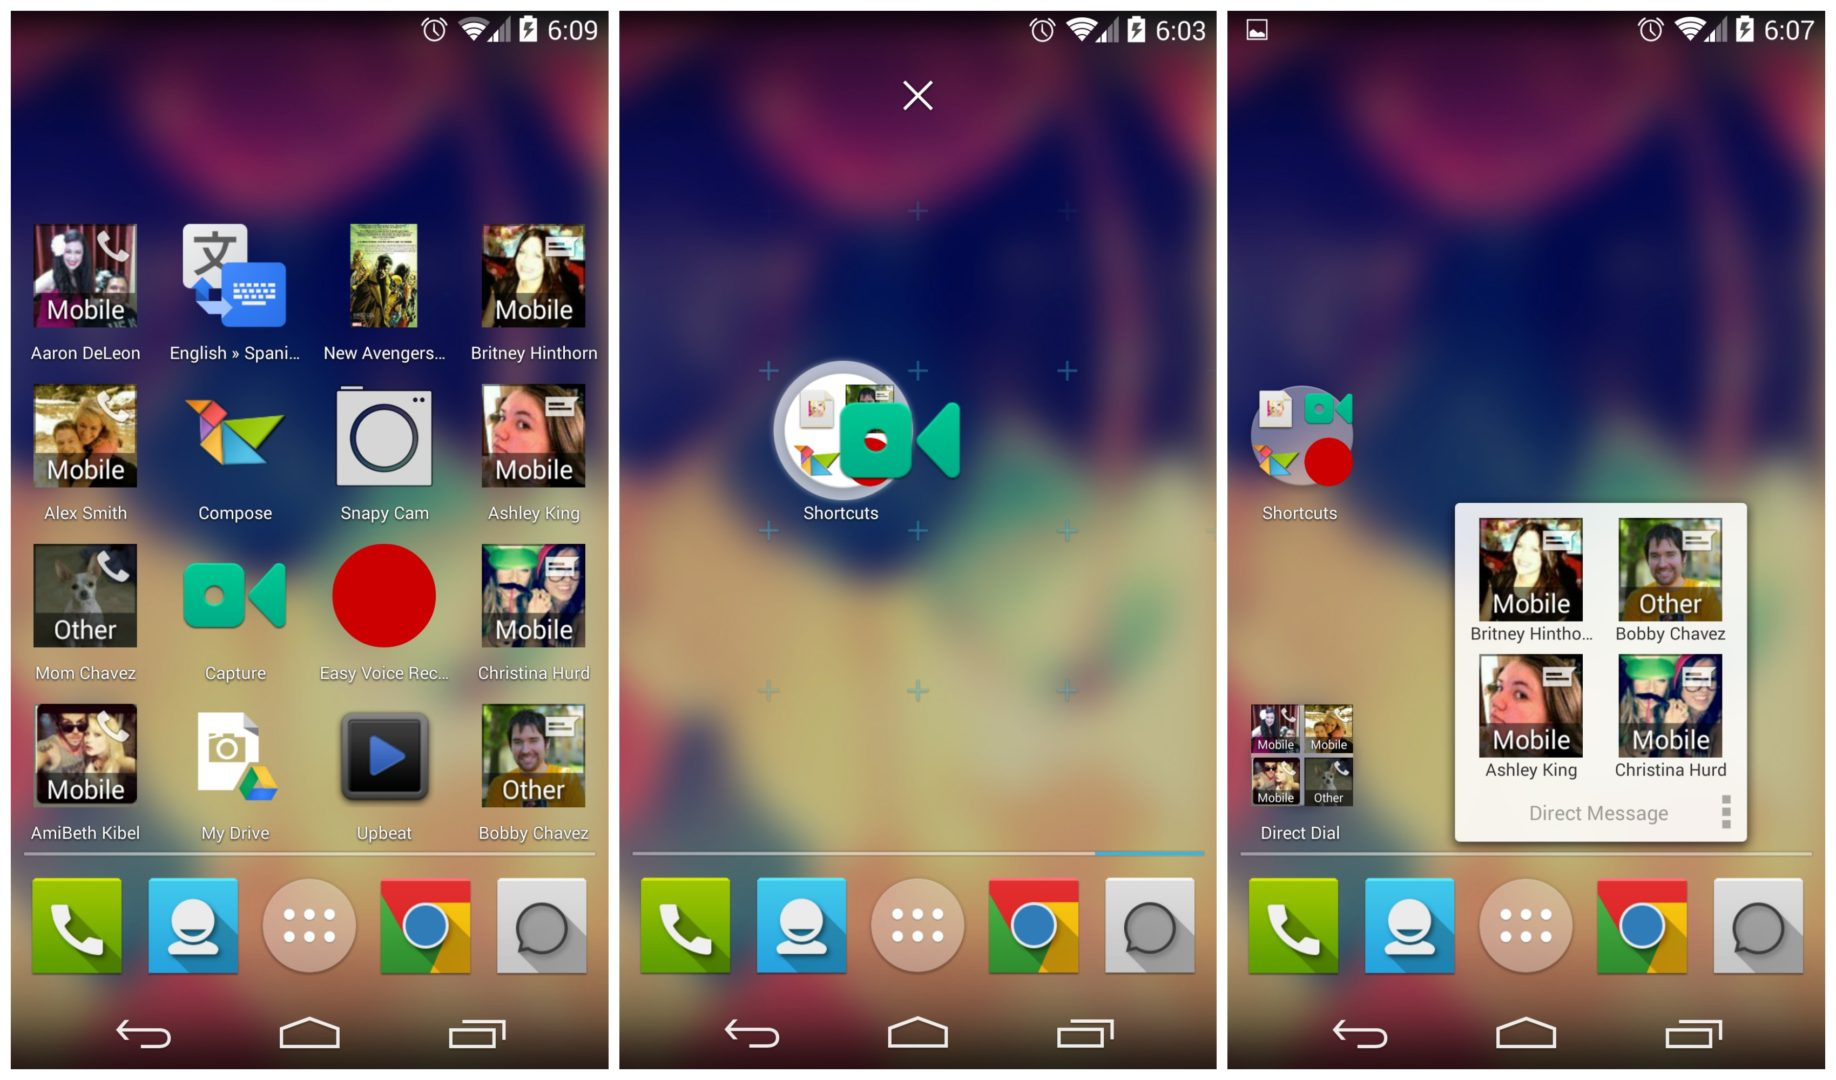 android features list, Android feature list, android features, features of android, android list,